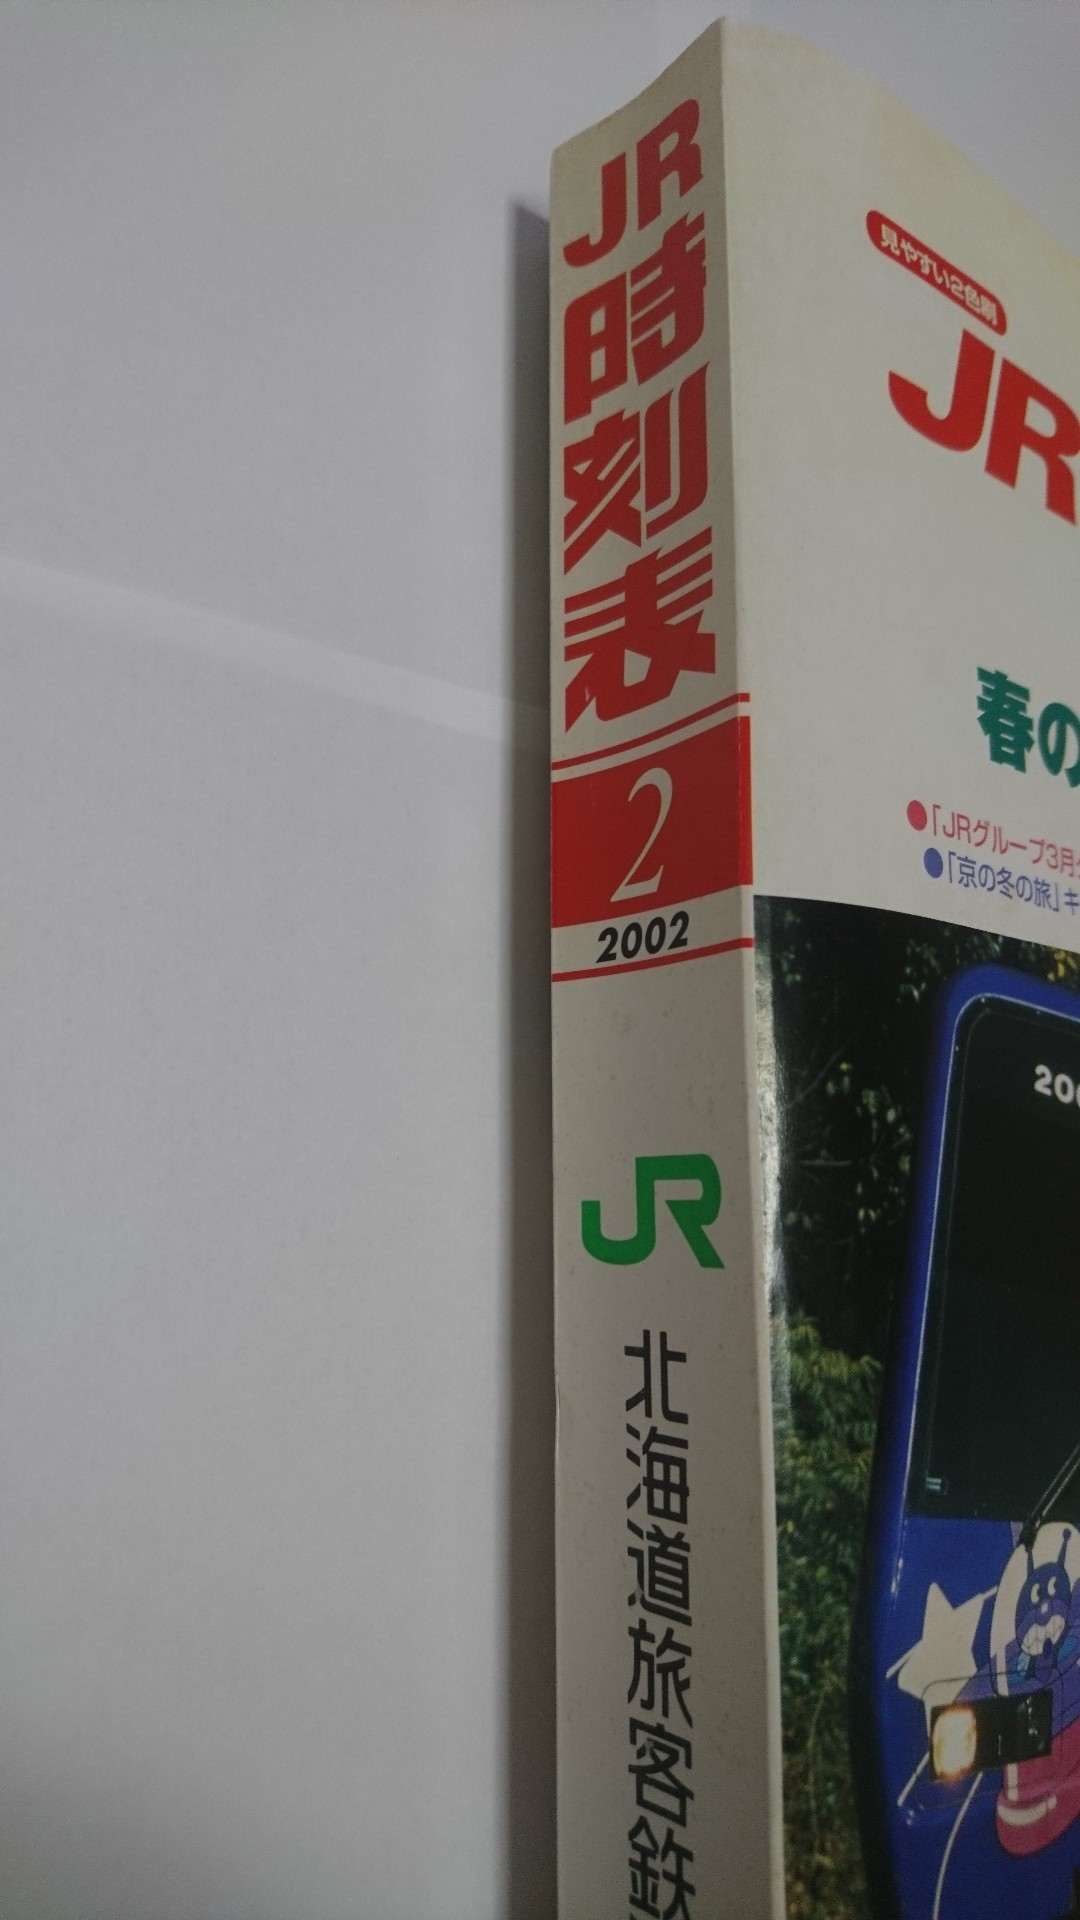 JR時刻表2002年2月号、あずさ2号復活!JR北海道旅客鉄道株式会社、発行所、交通新聞社_b0106766_19390211.jpg